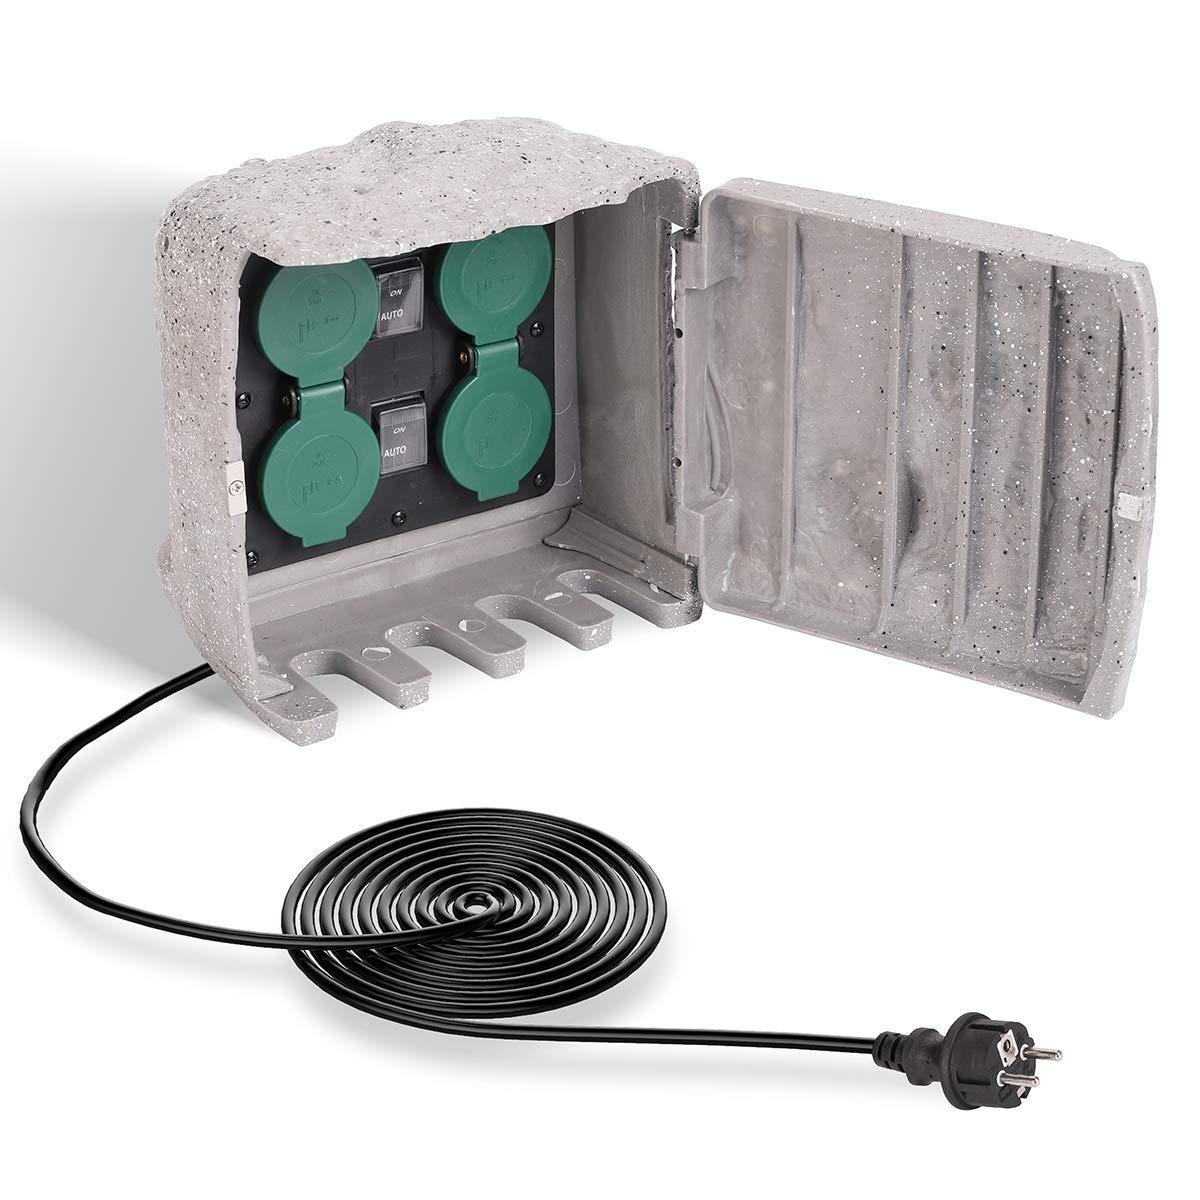 SALCAR Toma de Corriente para jardín a Prueba de Agua con 4 Tomas CA, Cable de Extensión de 3M con Sensor Crepuscular Tomas para Exteriores, 3680W 16A Tomas de Corriente Externa, Gris: